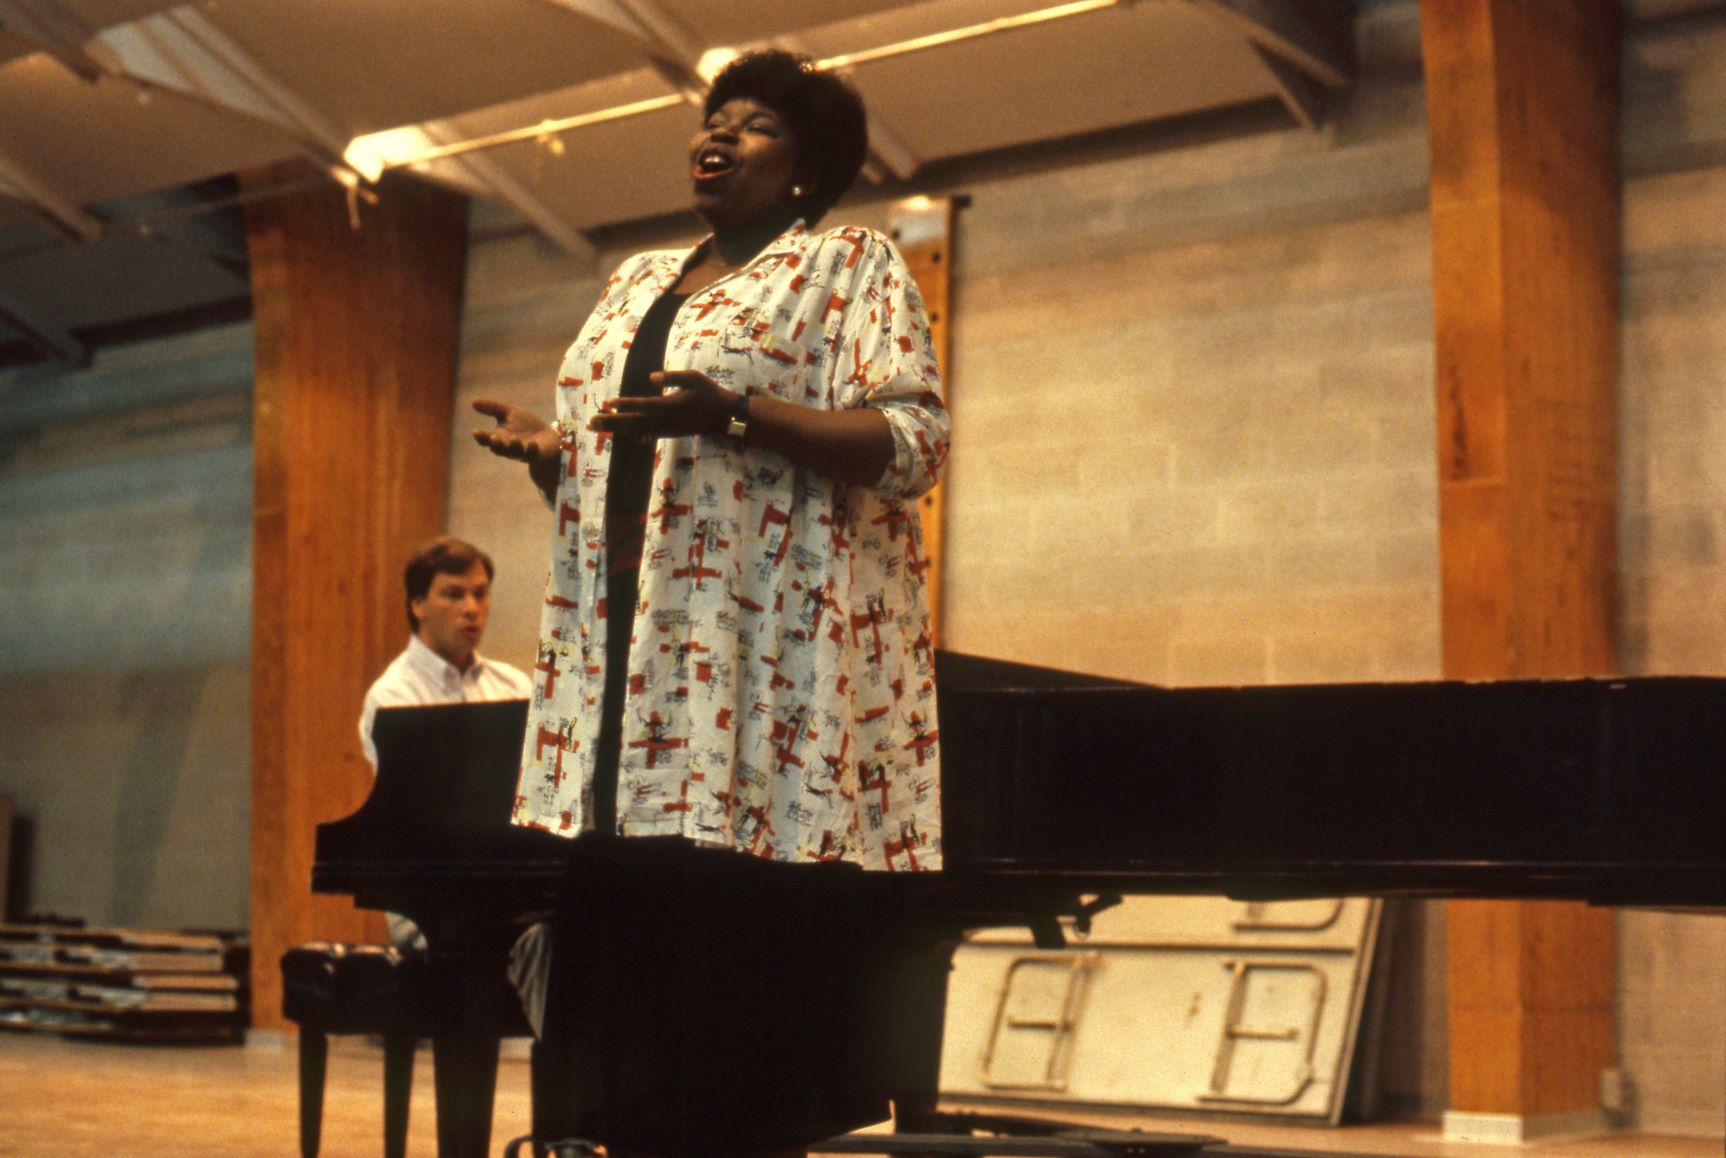 Caption: Marvis Martin performs at Interlochen in 1985, Credit: Interlochen Center for the Arts